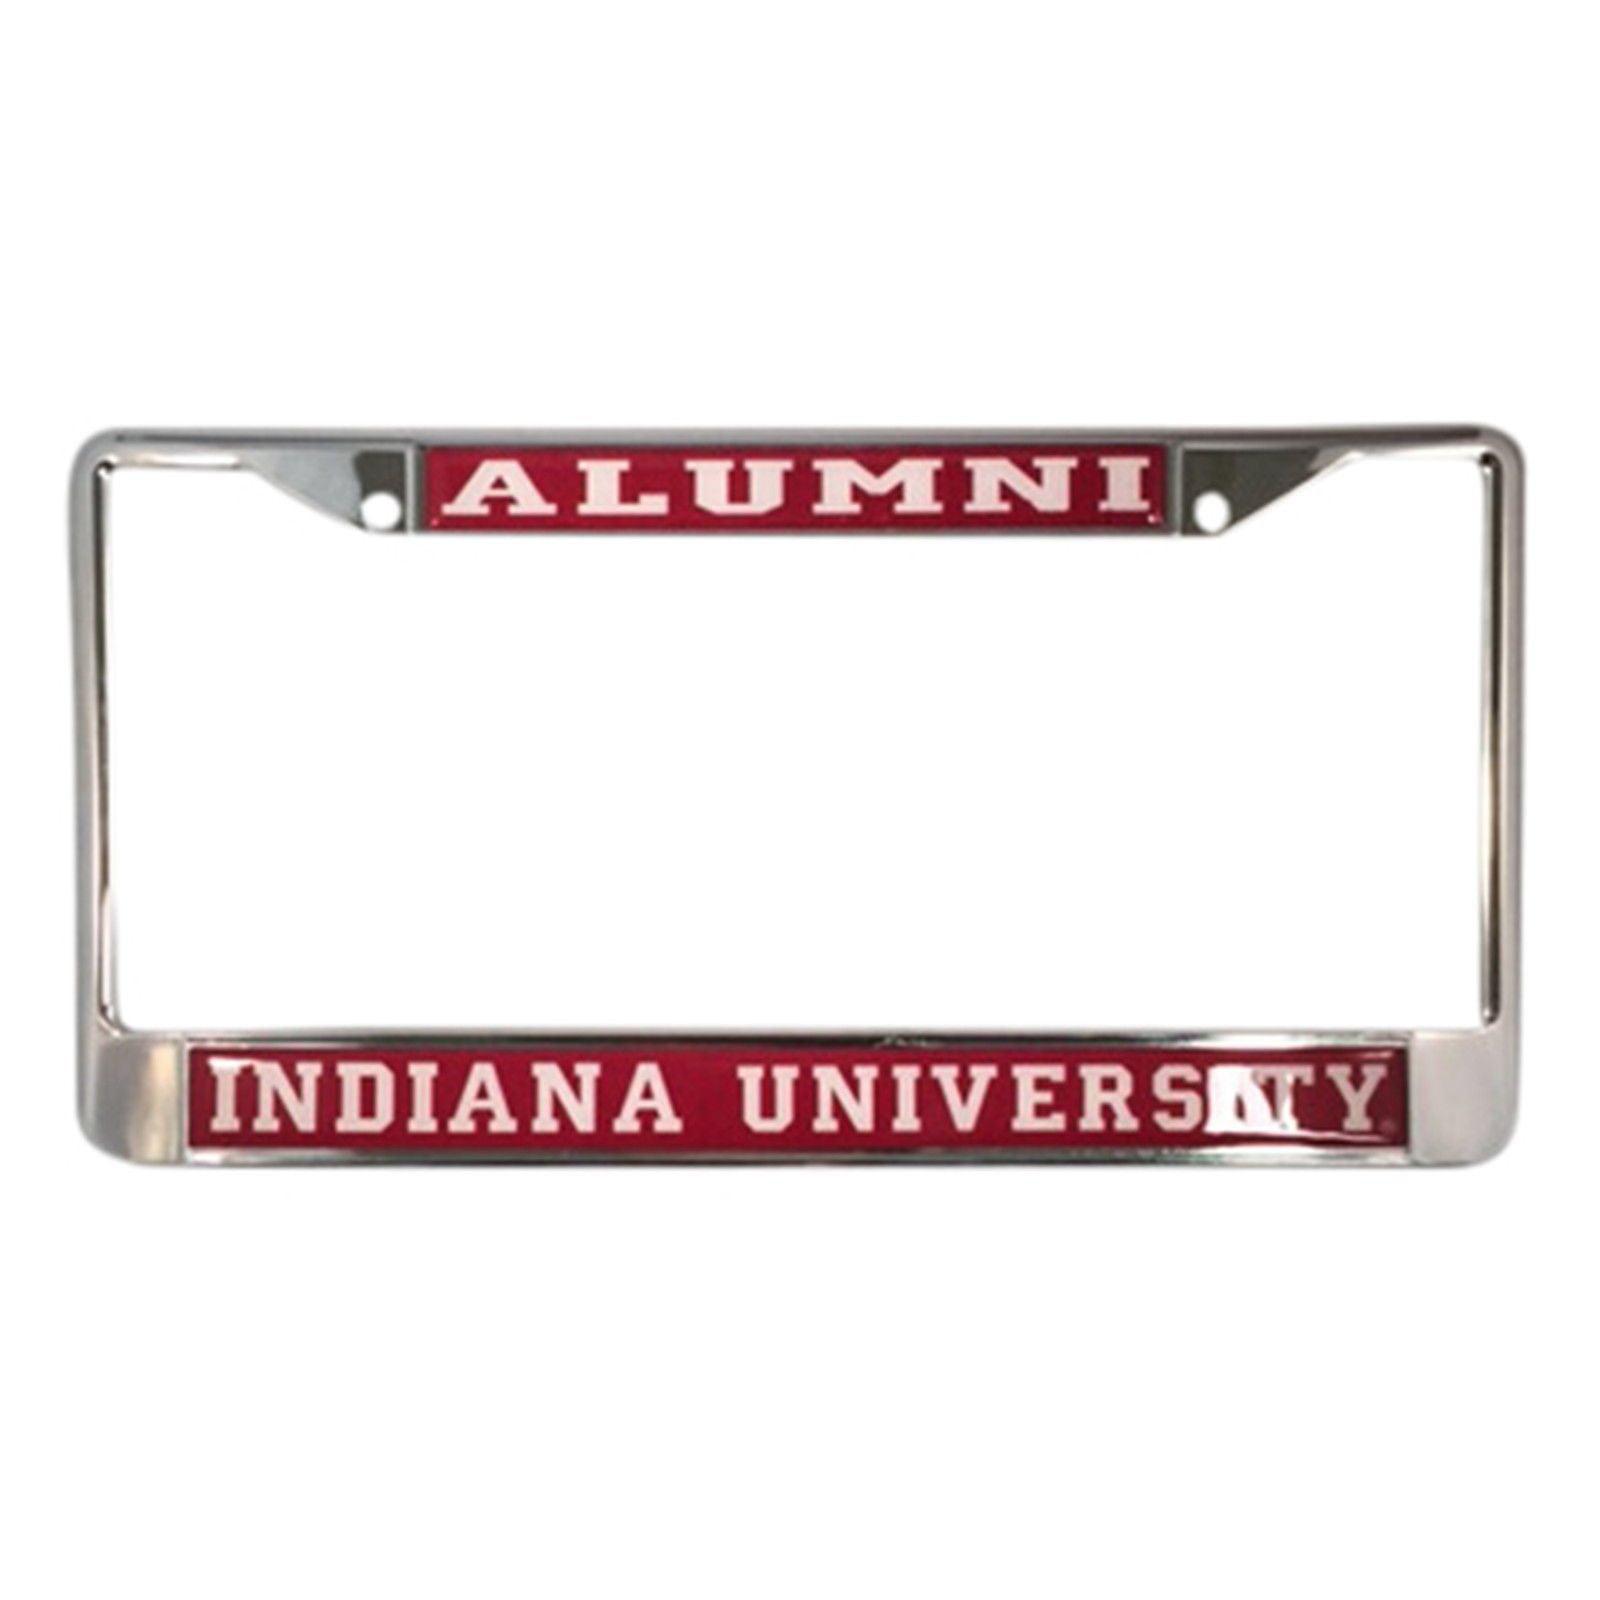 Indiana University Hoosiers Alumni License Plate Frame - Walmart.com